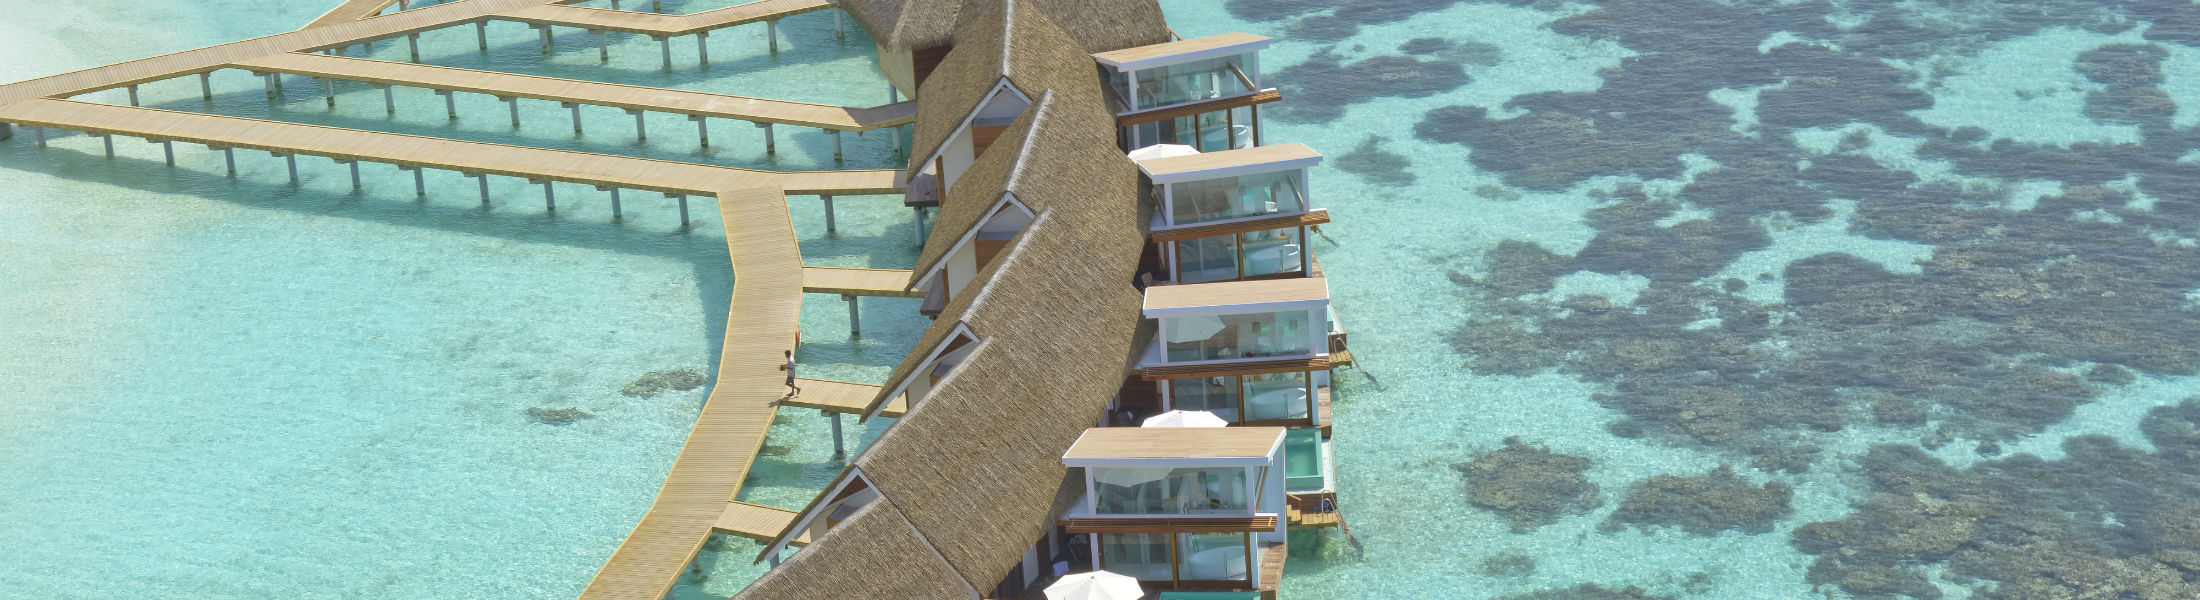 water bungalows in Kandolhu Maldives